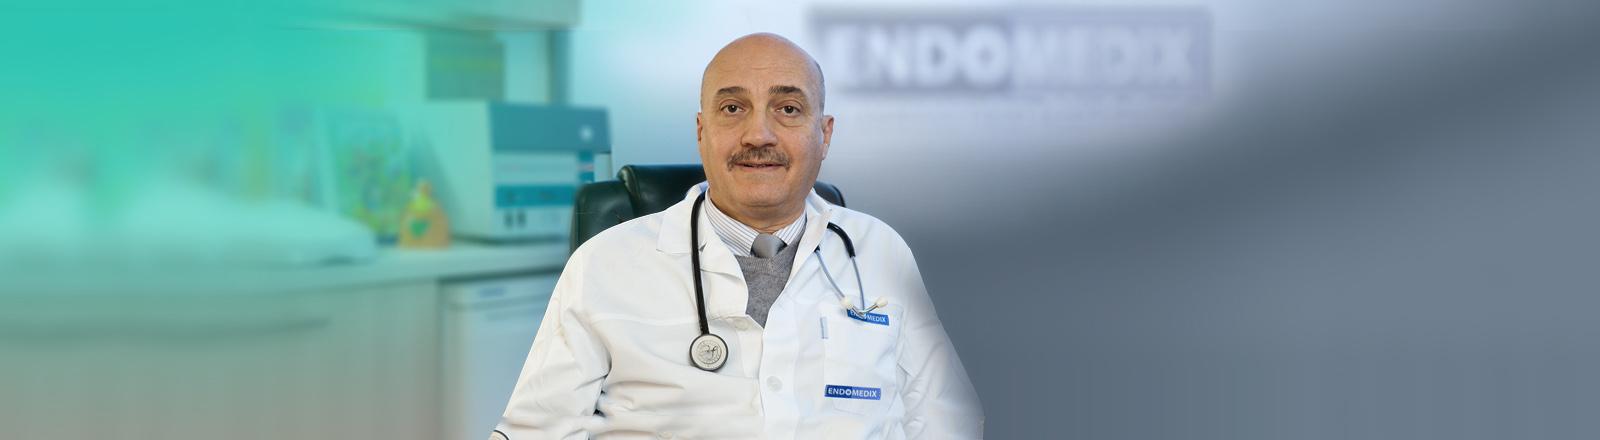 Endomedix Dr. Takáts Alajos